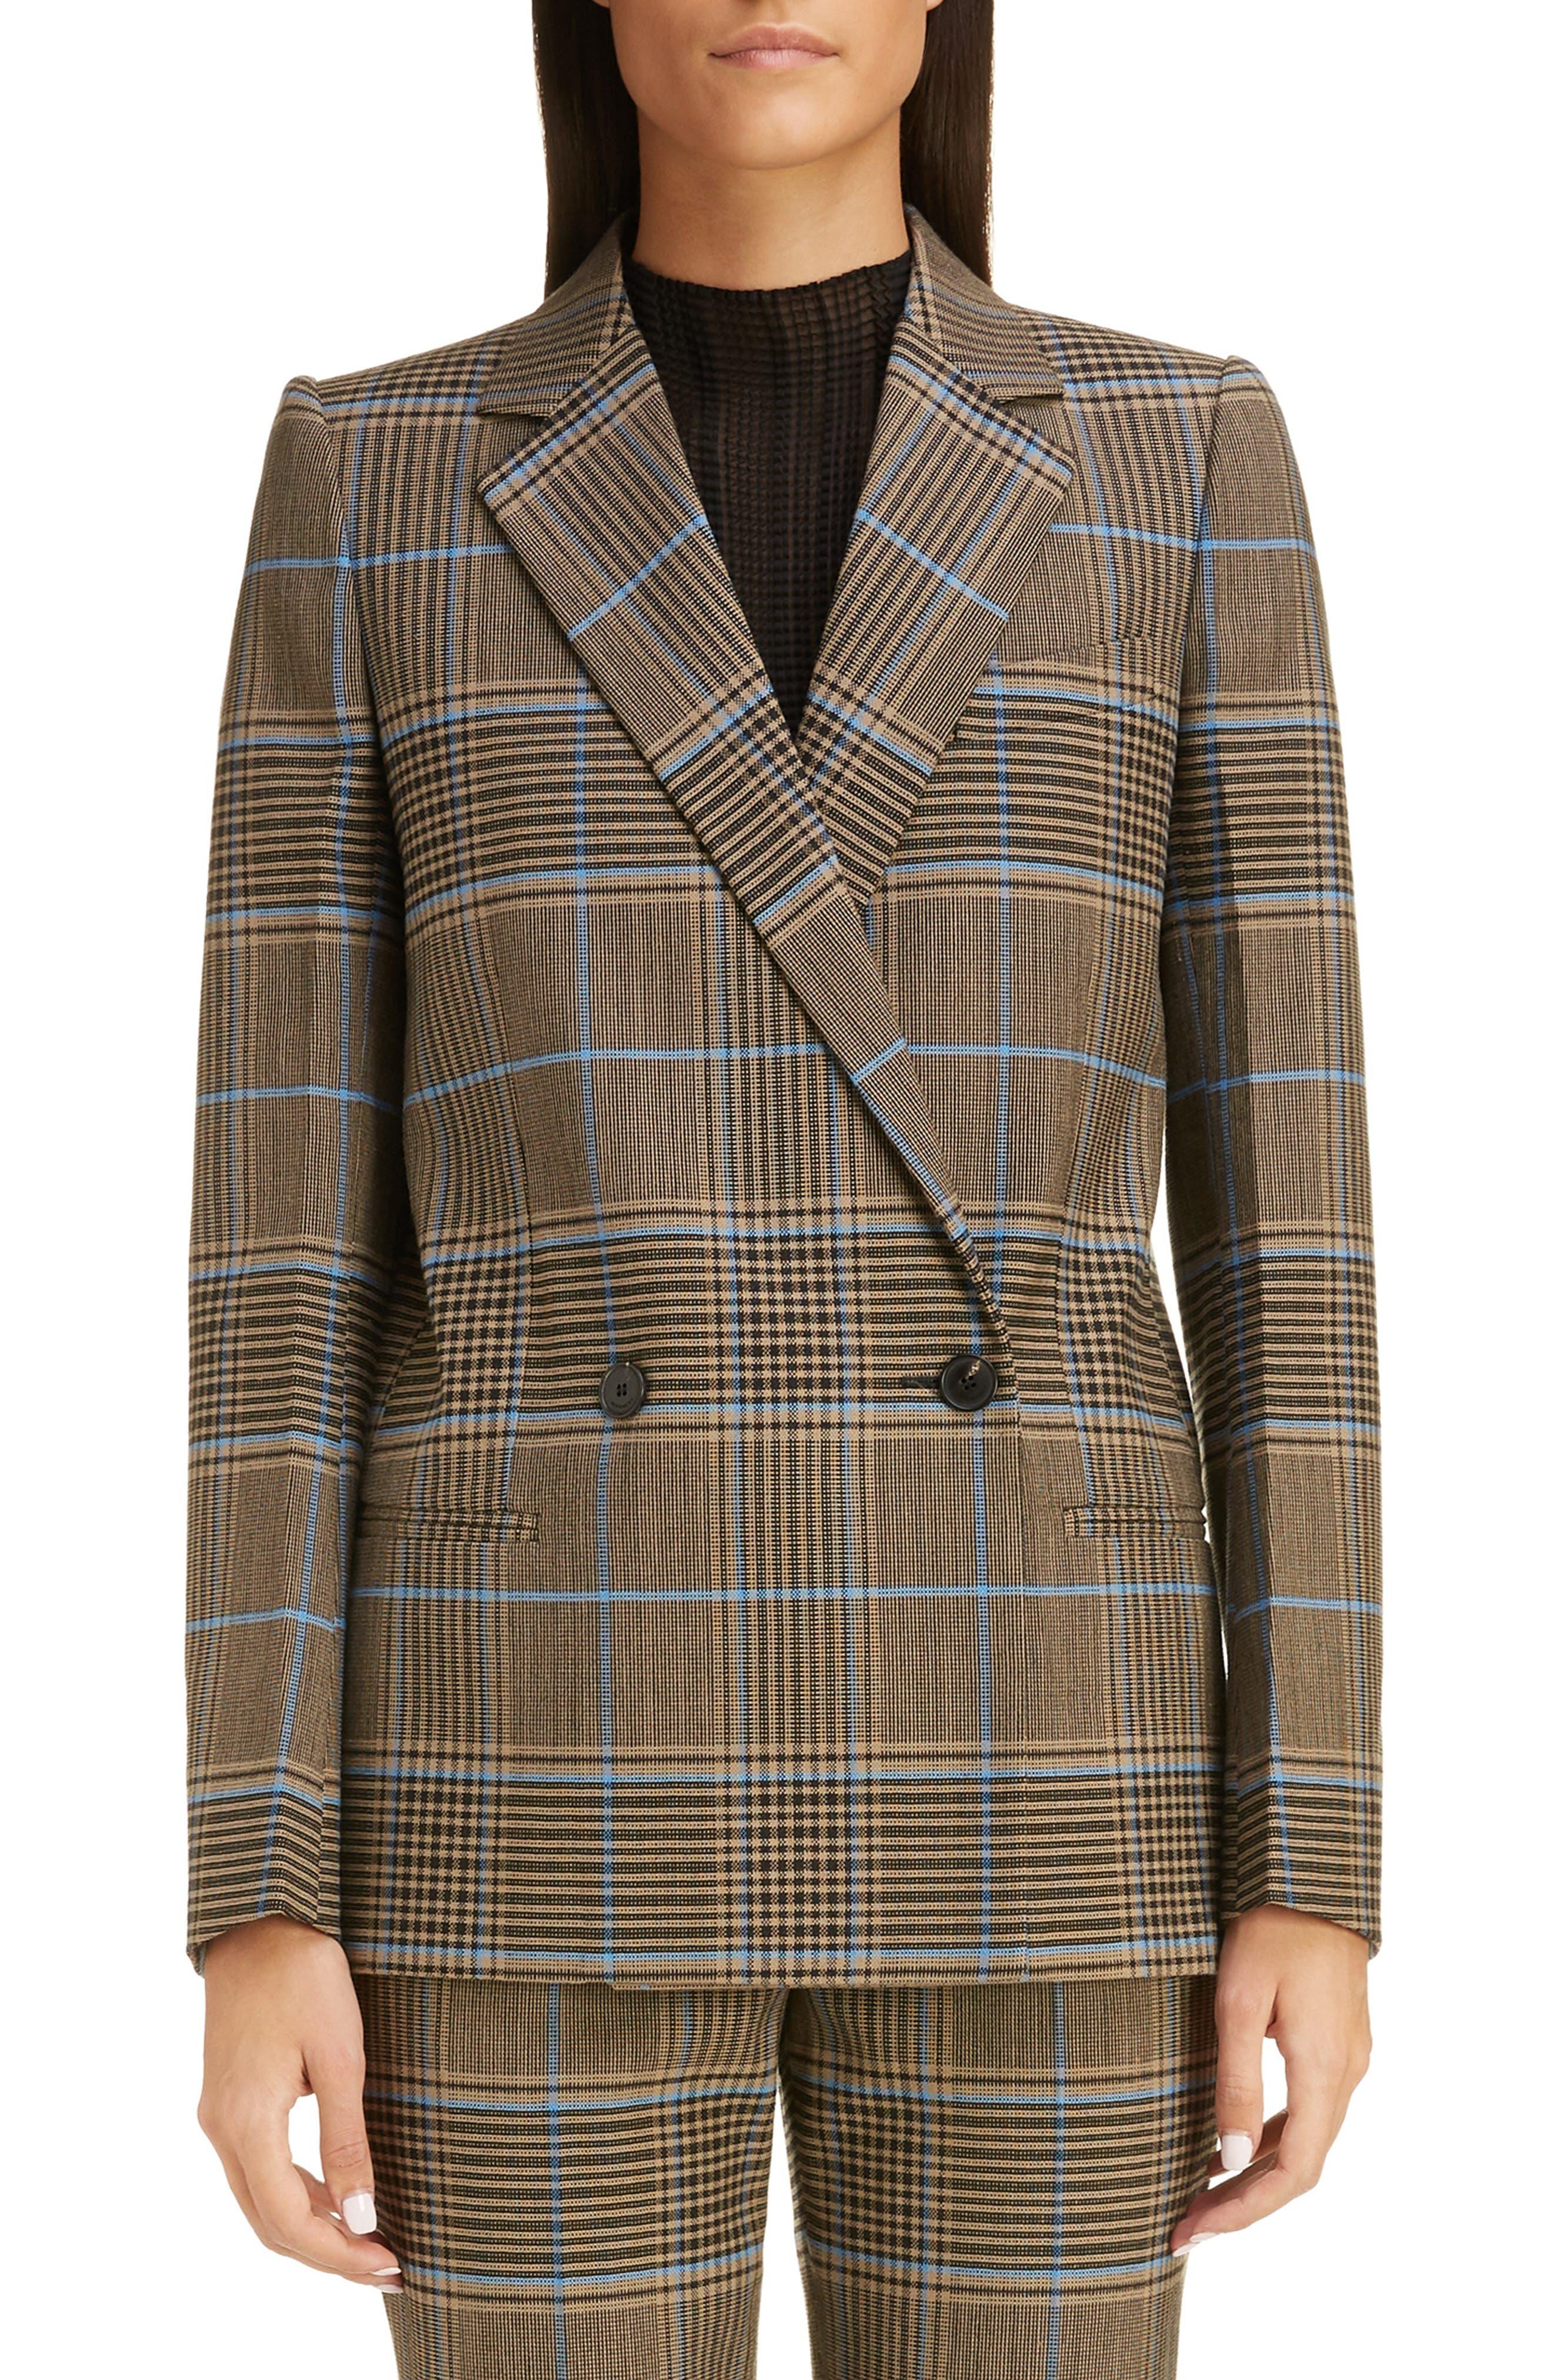 ff086e42c Women's Givenchy Coats & Jackets | Nordstrom